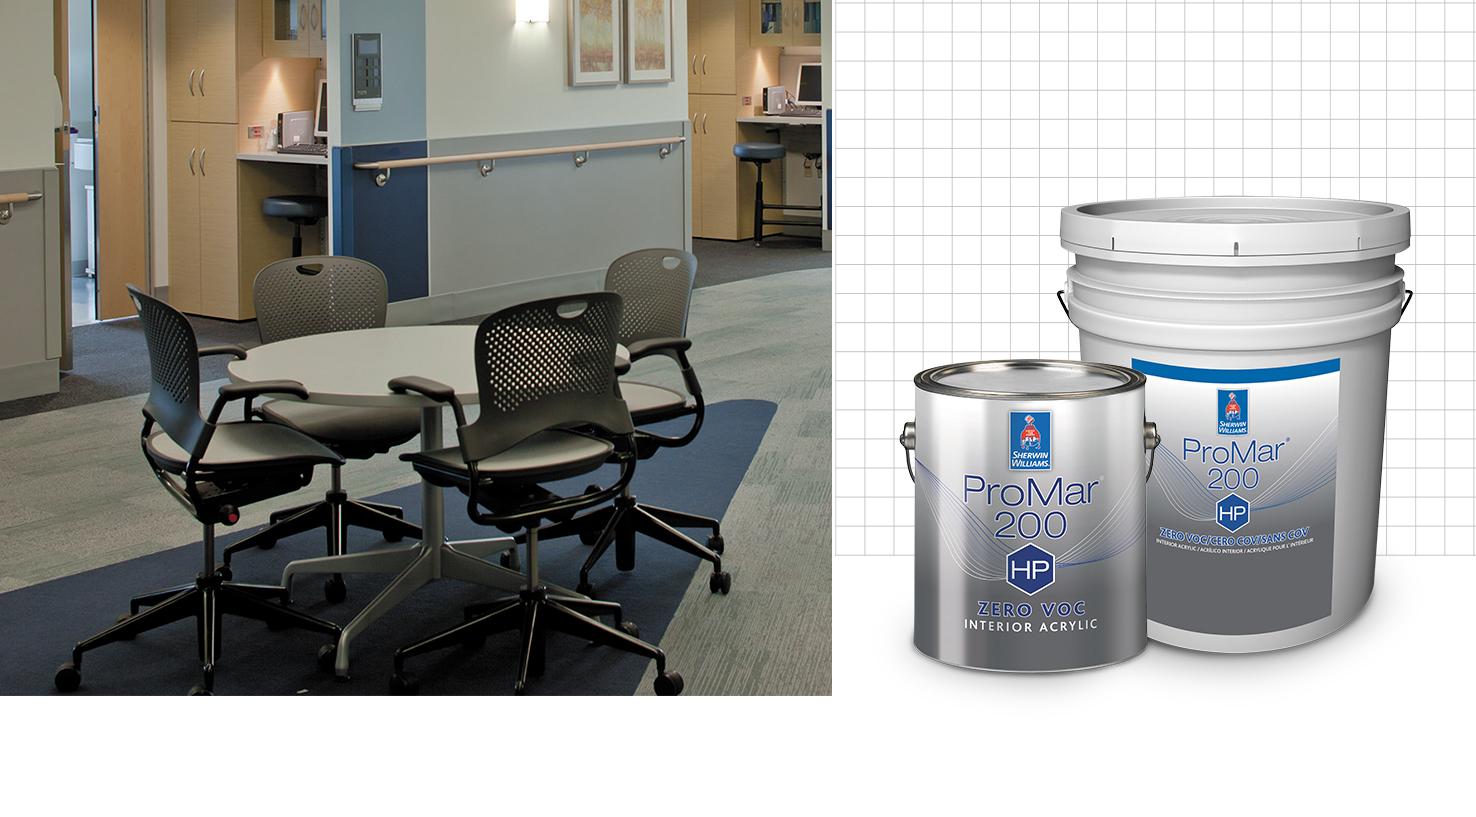 New Products Higher Performance Promar 200 Hp Zero Voc Ppc